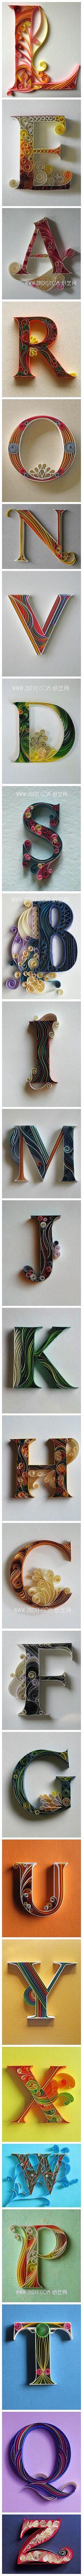 Yan Yan DIY origami paper paper letters appreciation